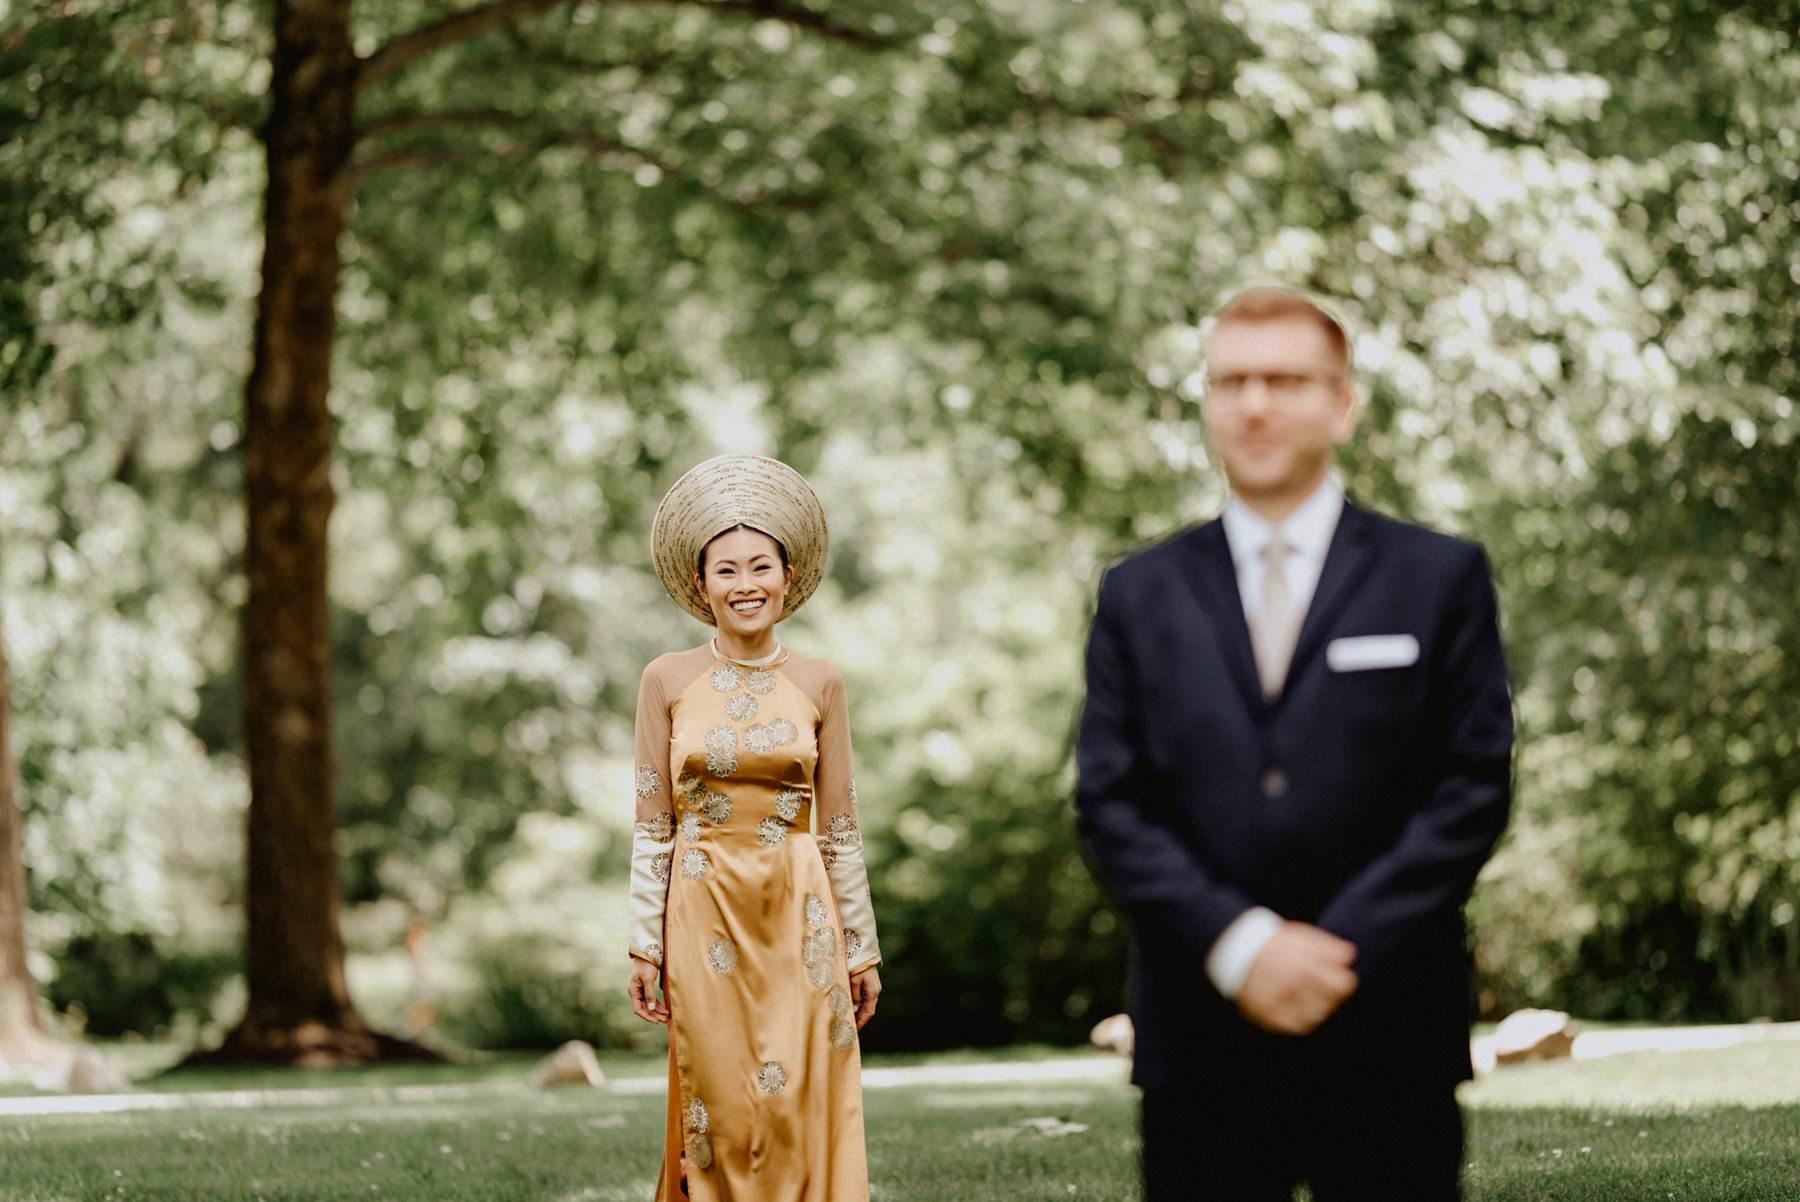 Appleford-estate-wedding-21.jpg